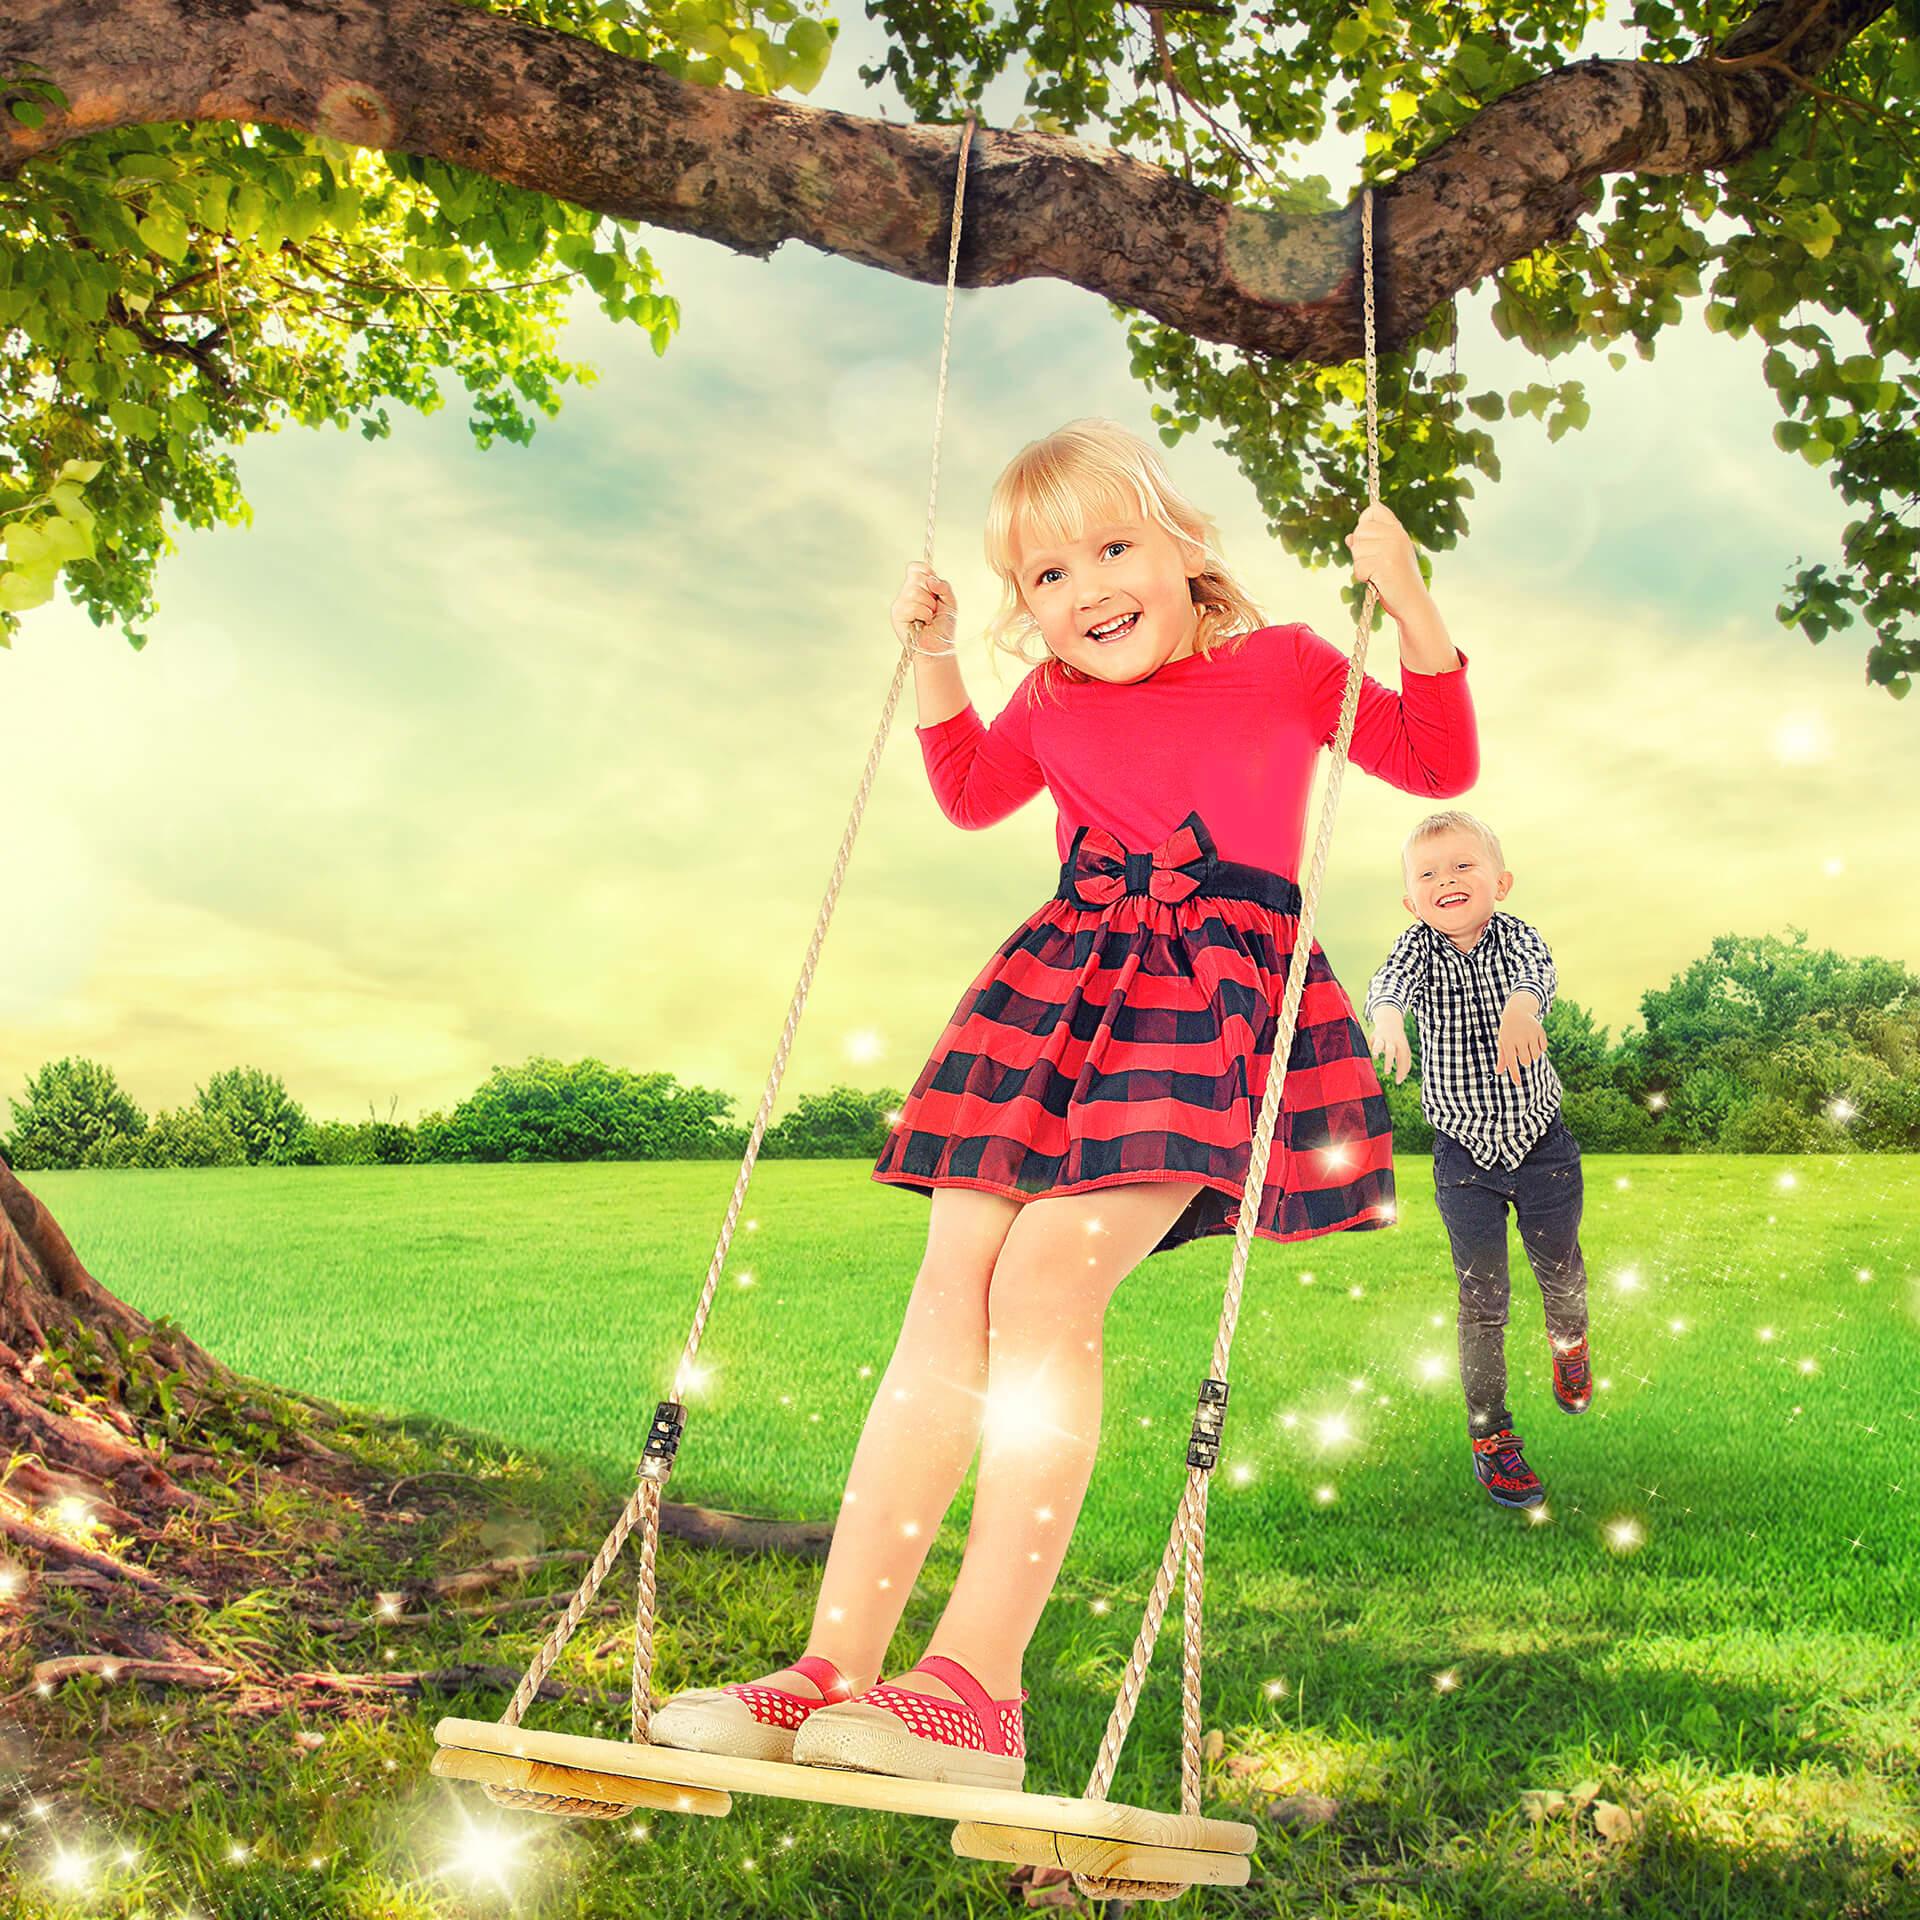 kids photoshoots rushedn from kline studios